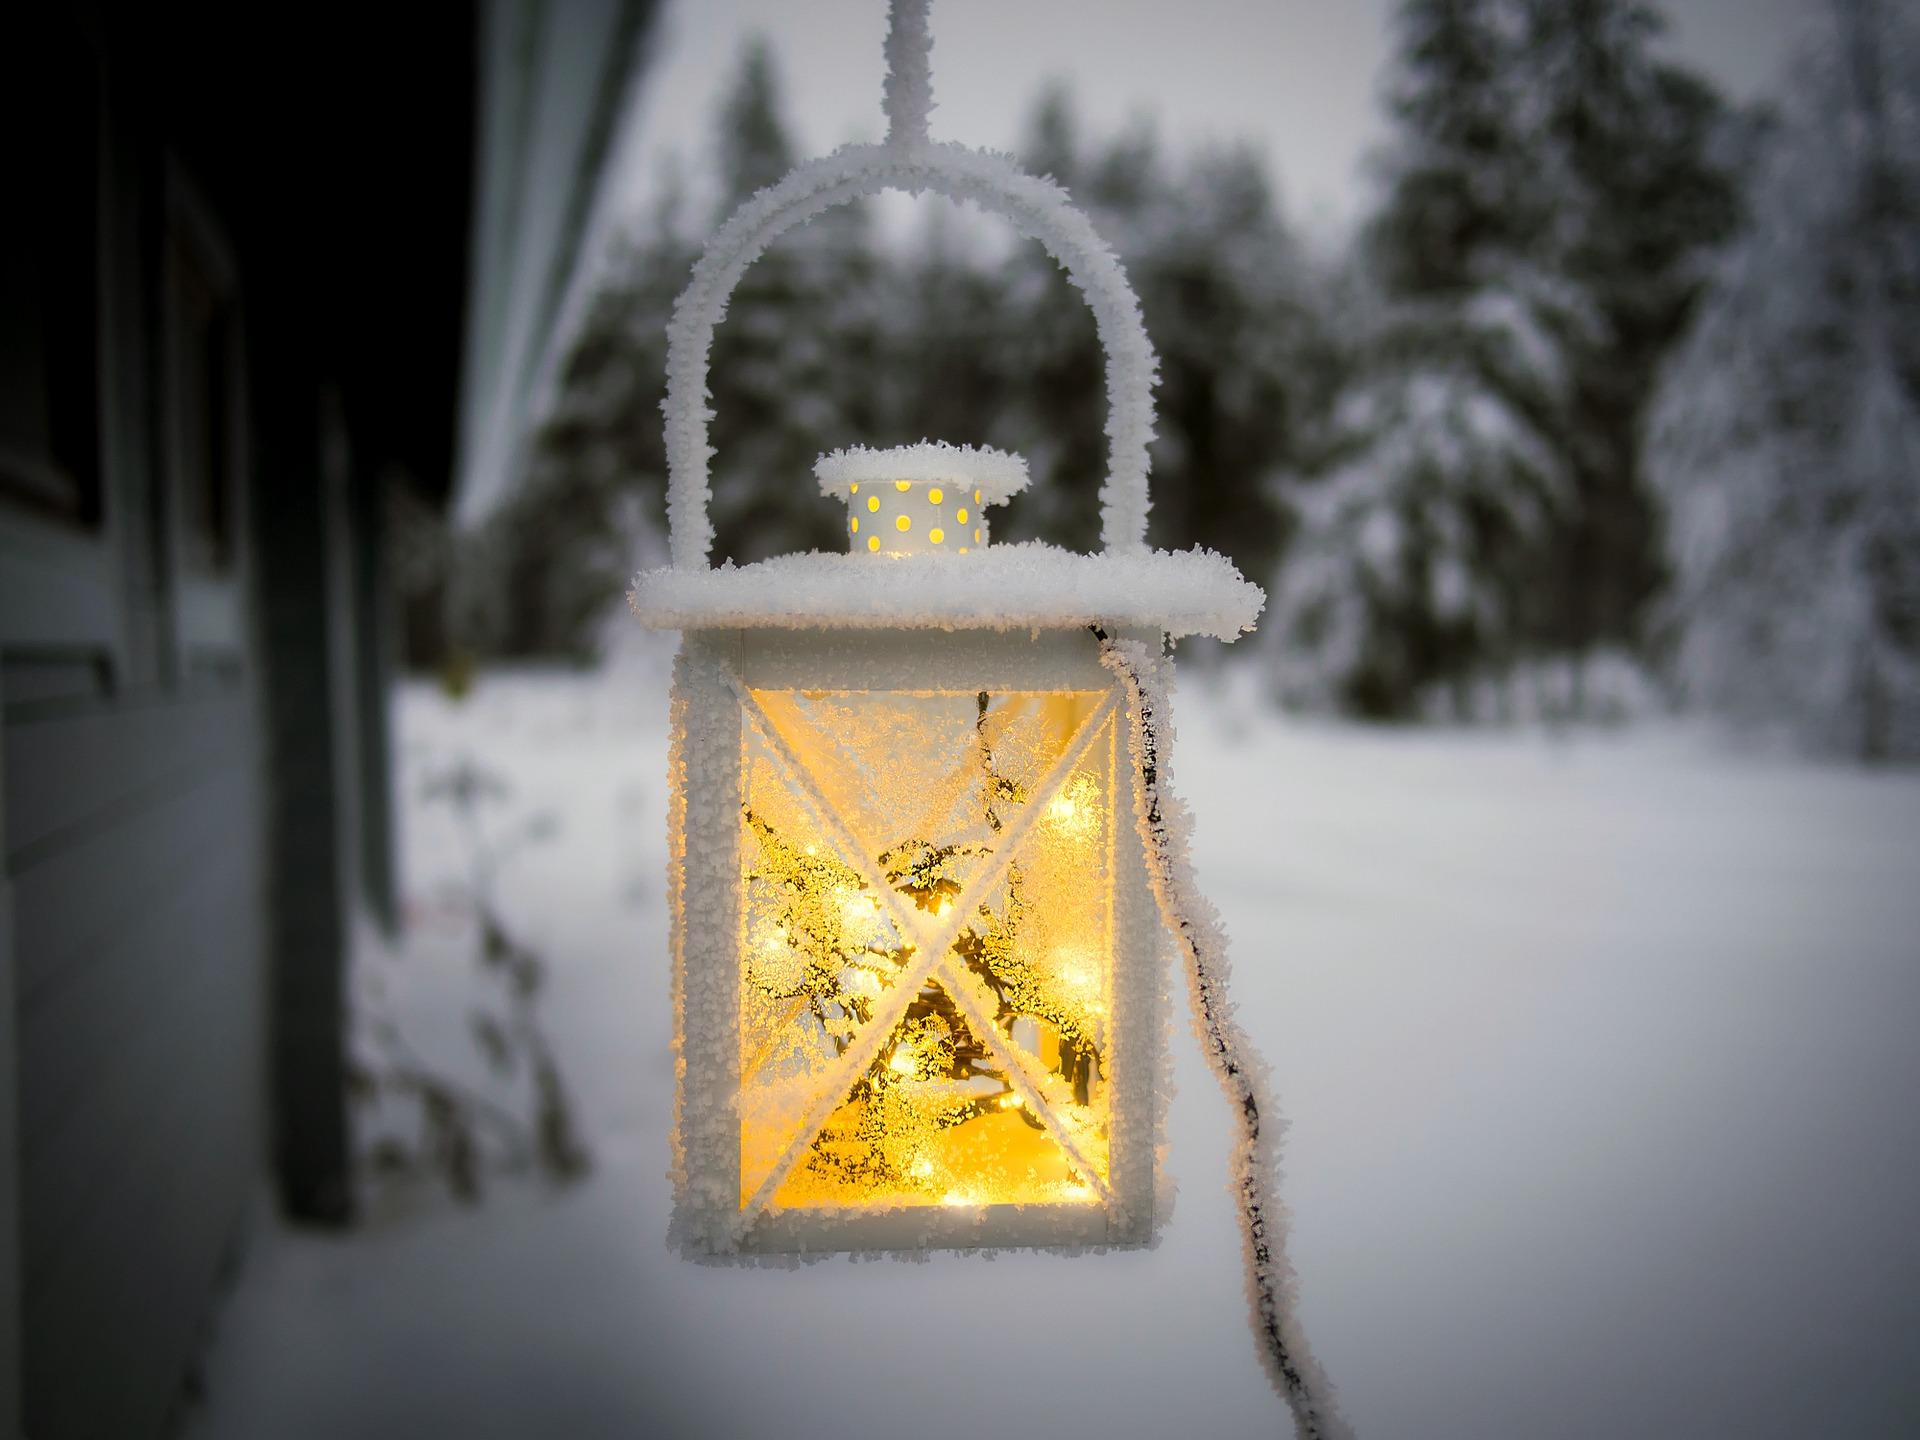 lighting, winter